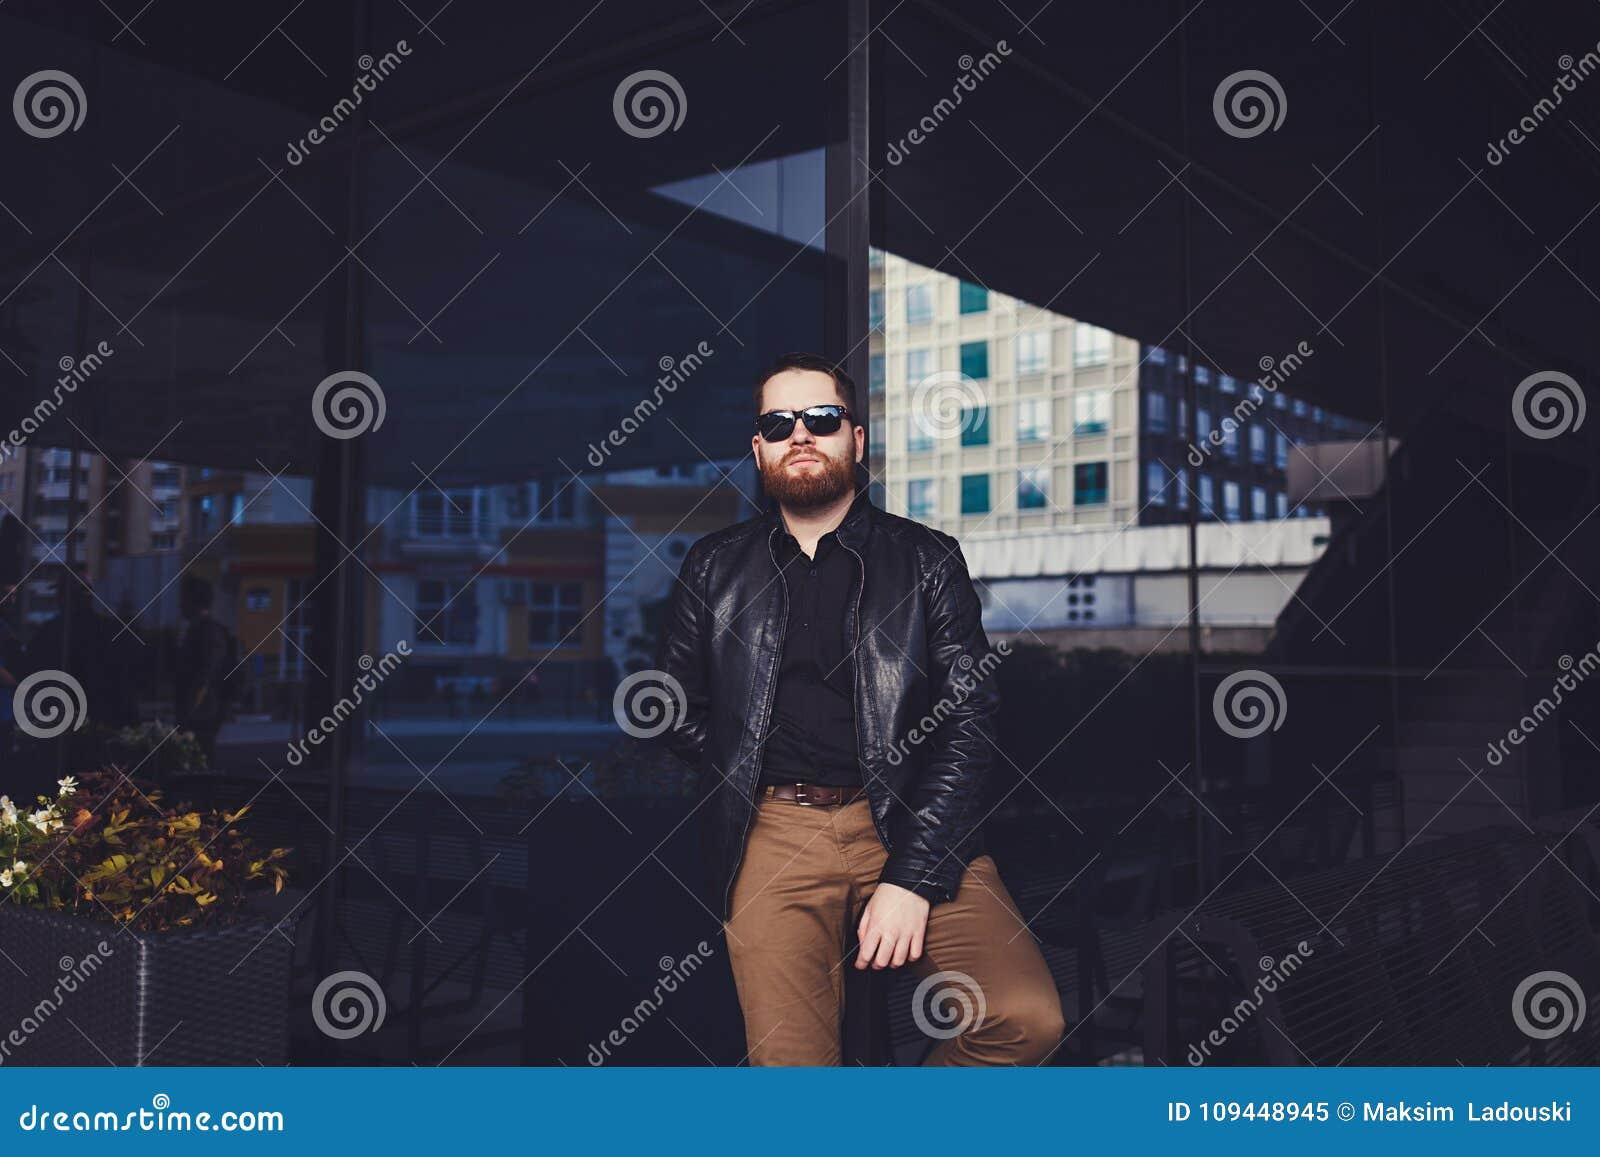 Young beard man posing in the street